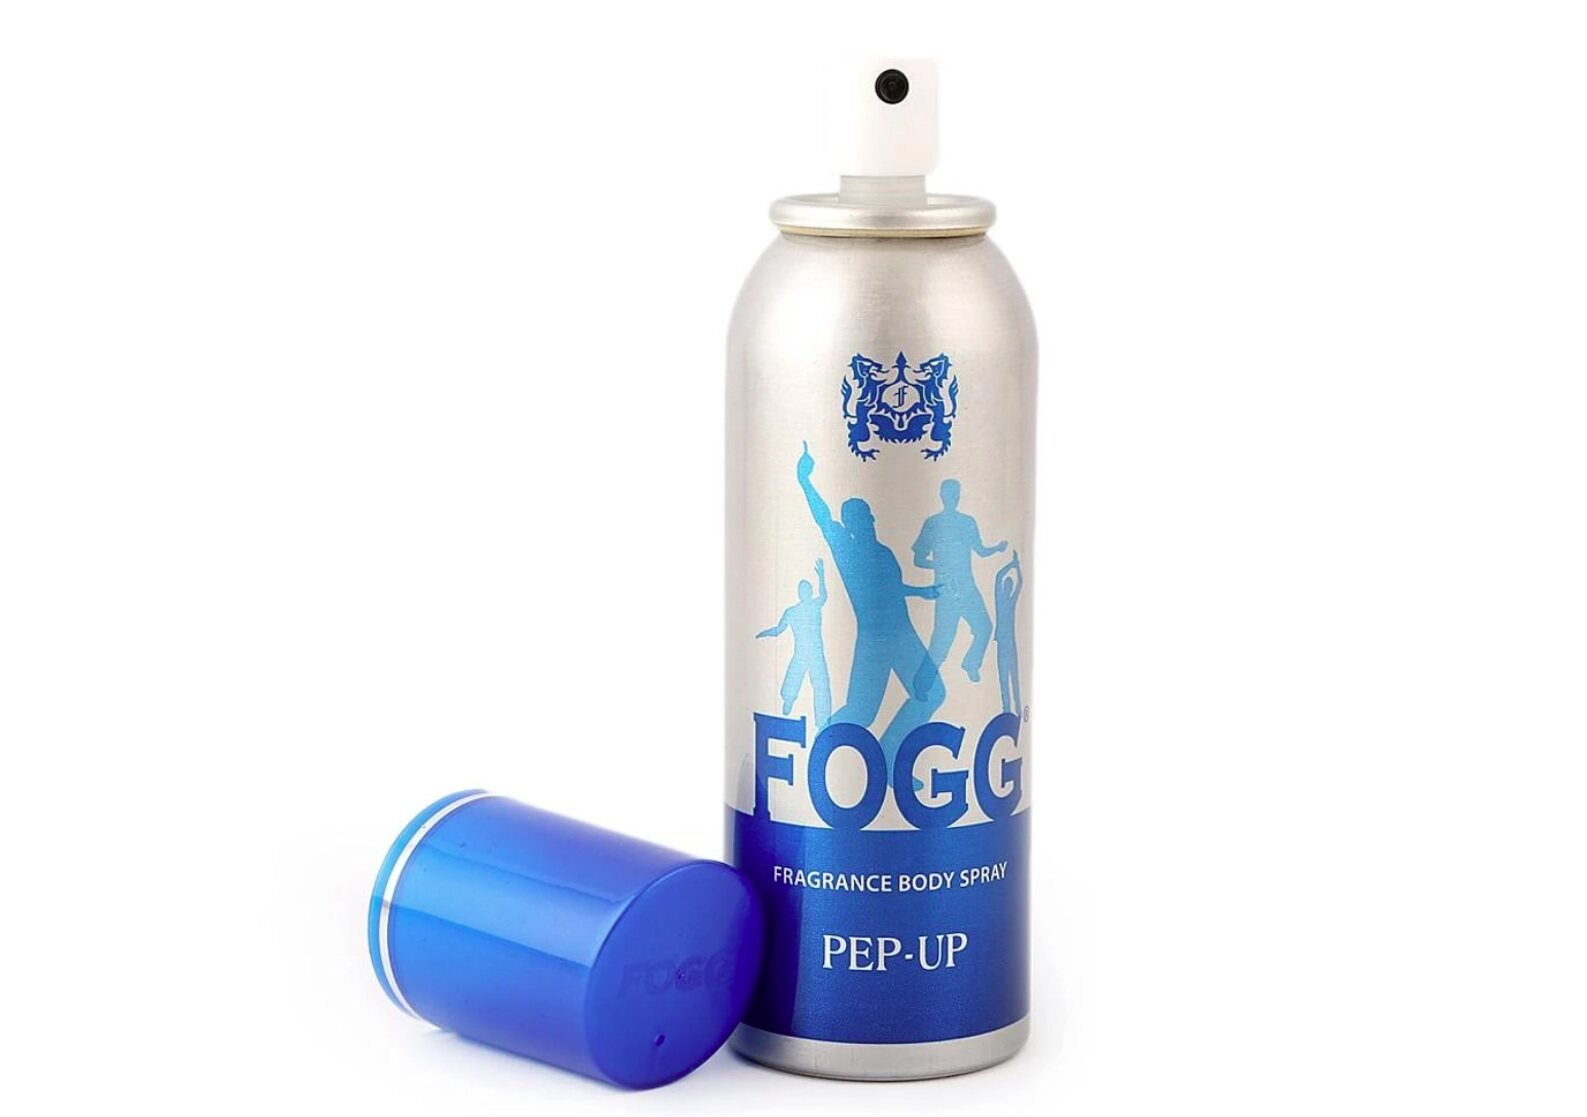 FOGG BODY SPRAY PEP UP 120 ML